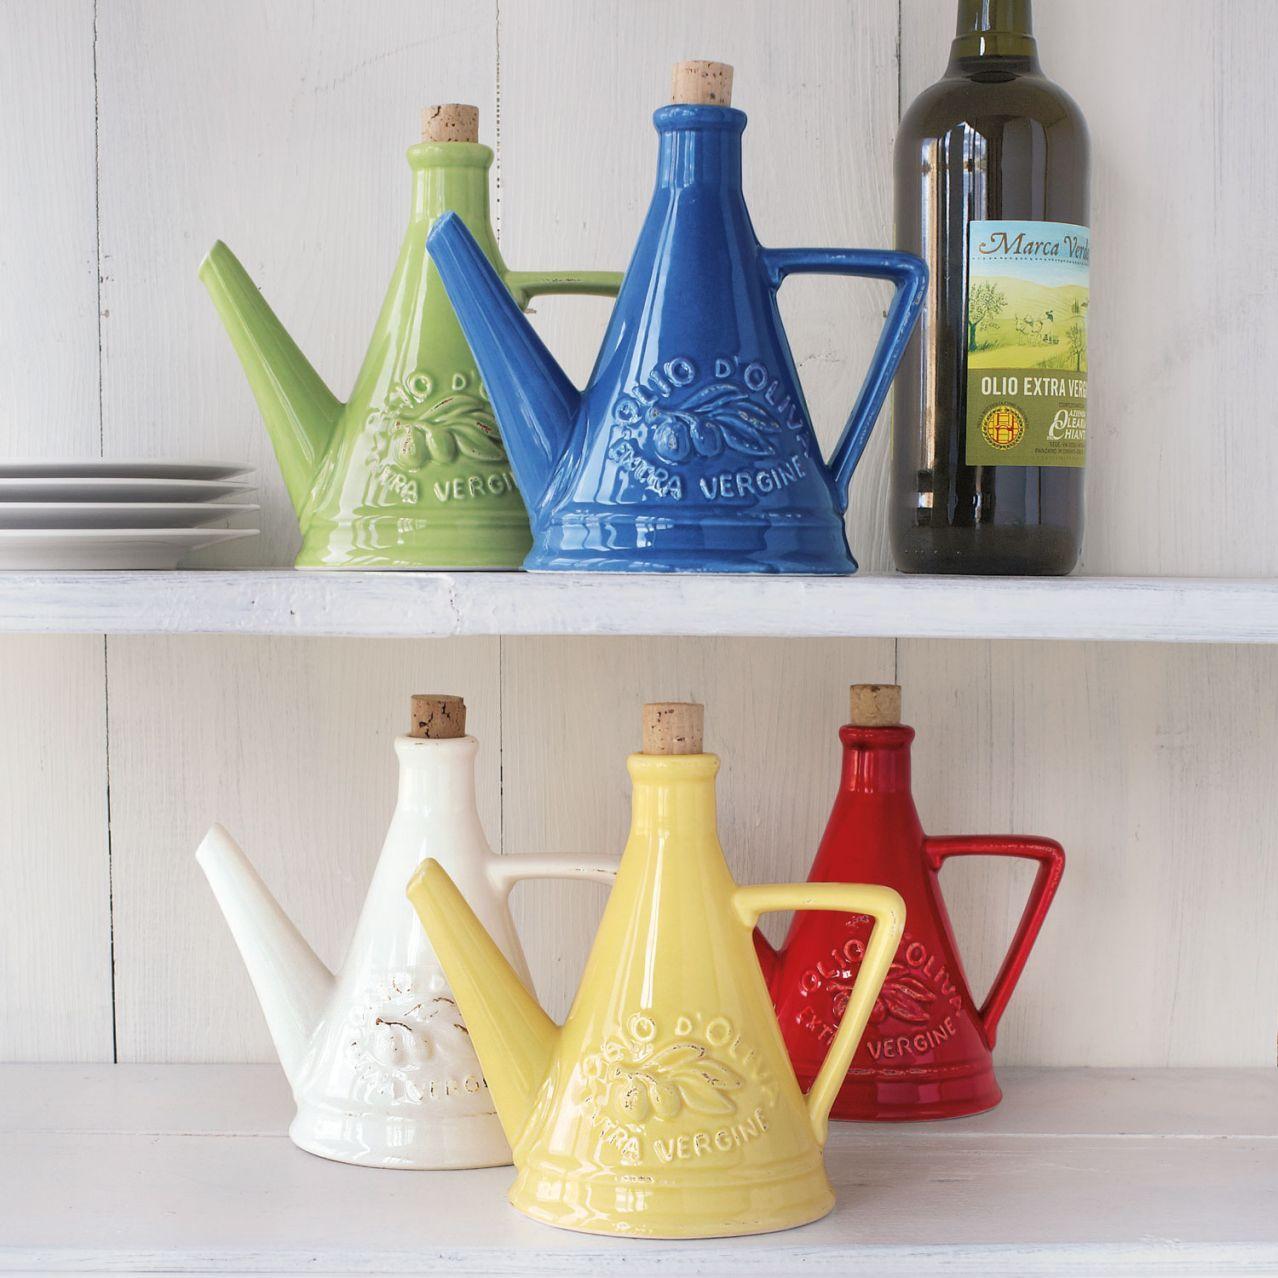 Italian Olive Oil Bottles Sur La Table Olive Oil